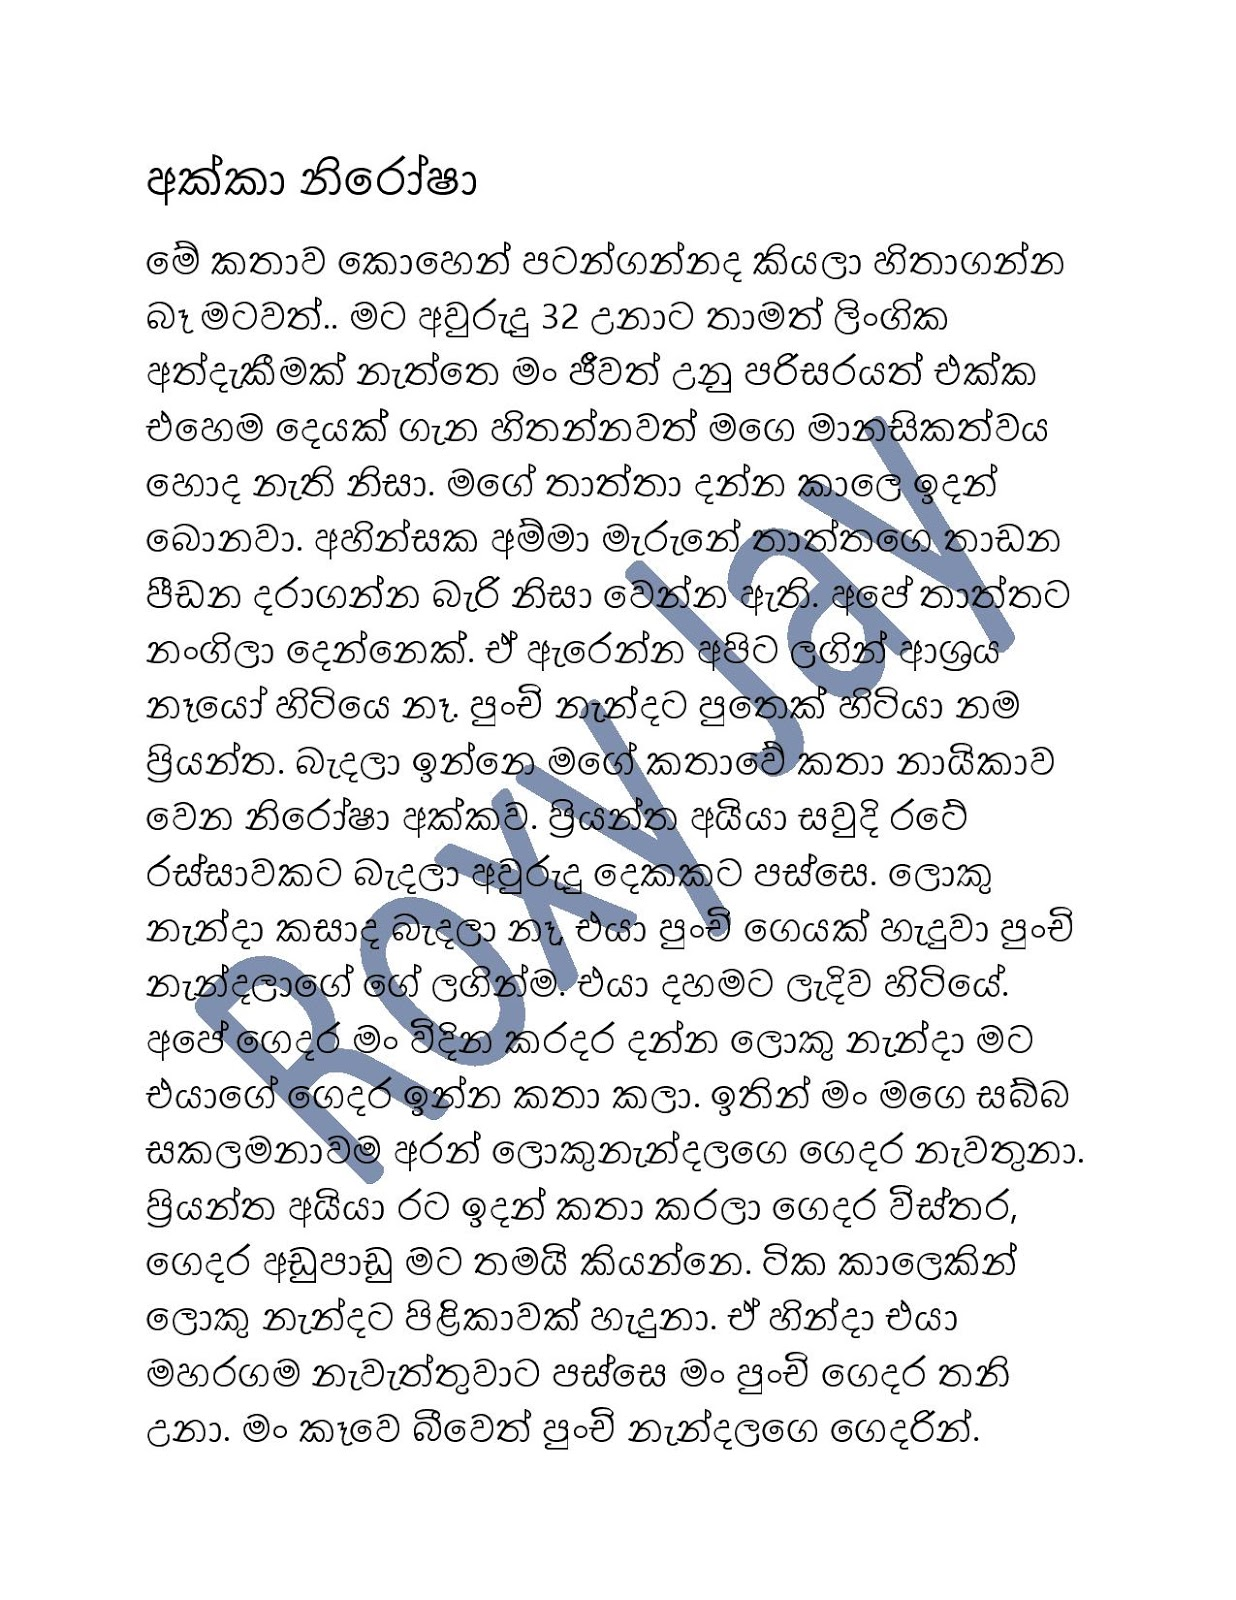 NiroshaAkka - Sinhala Wal Katha